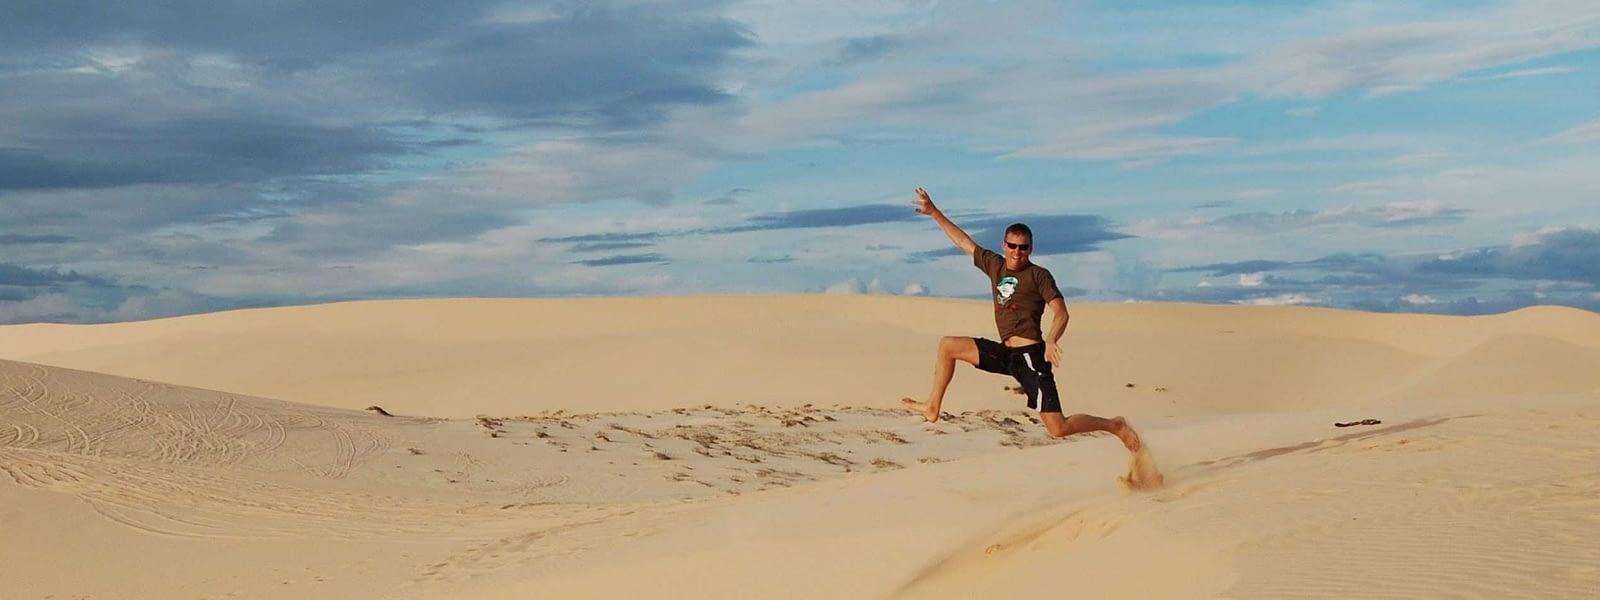 Bao Trang Sand Dunes Vietnam